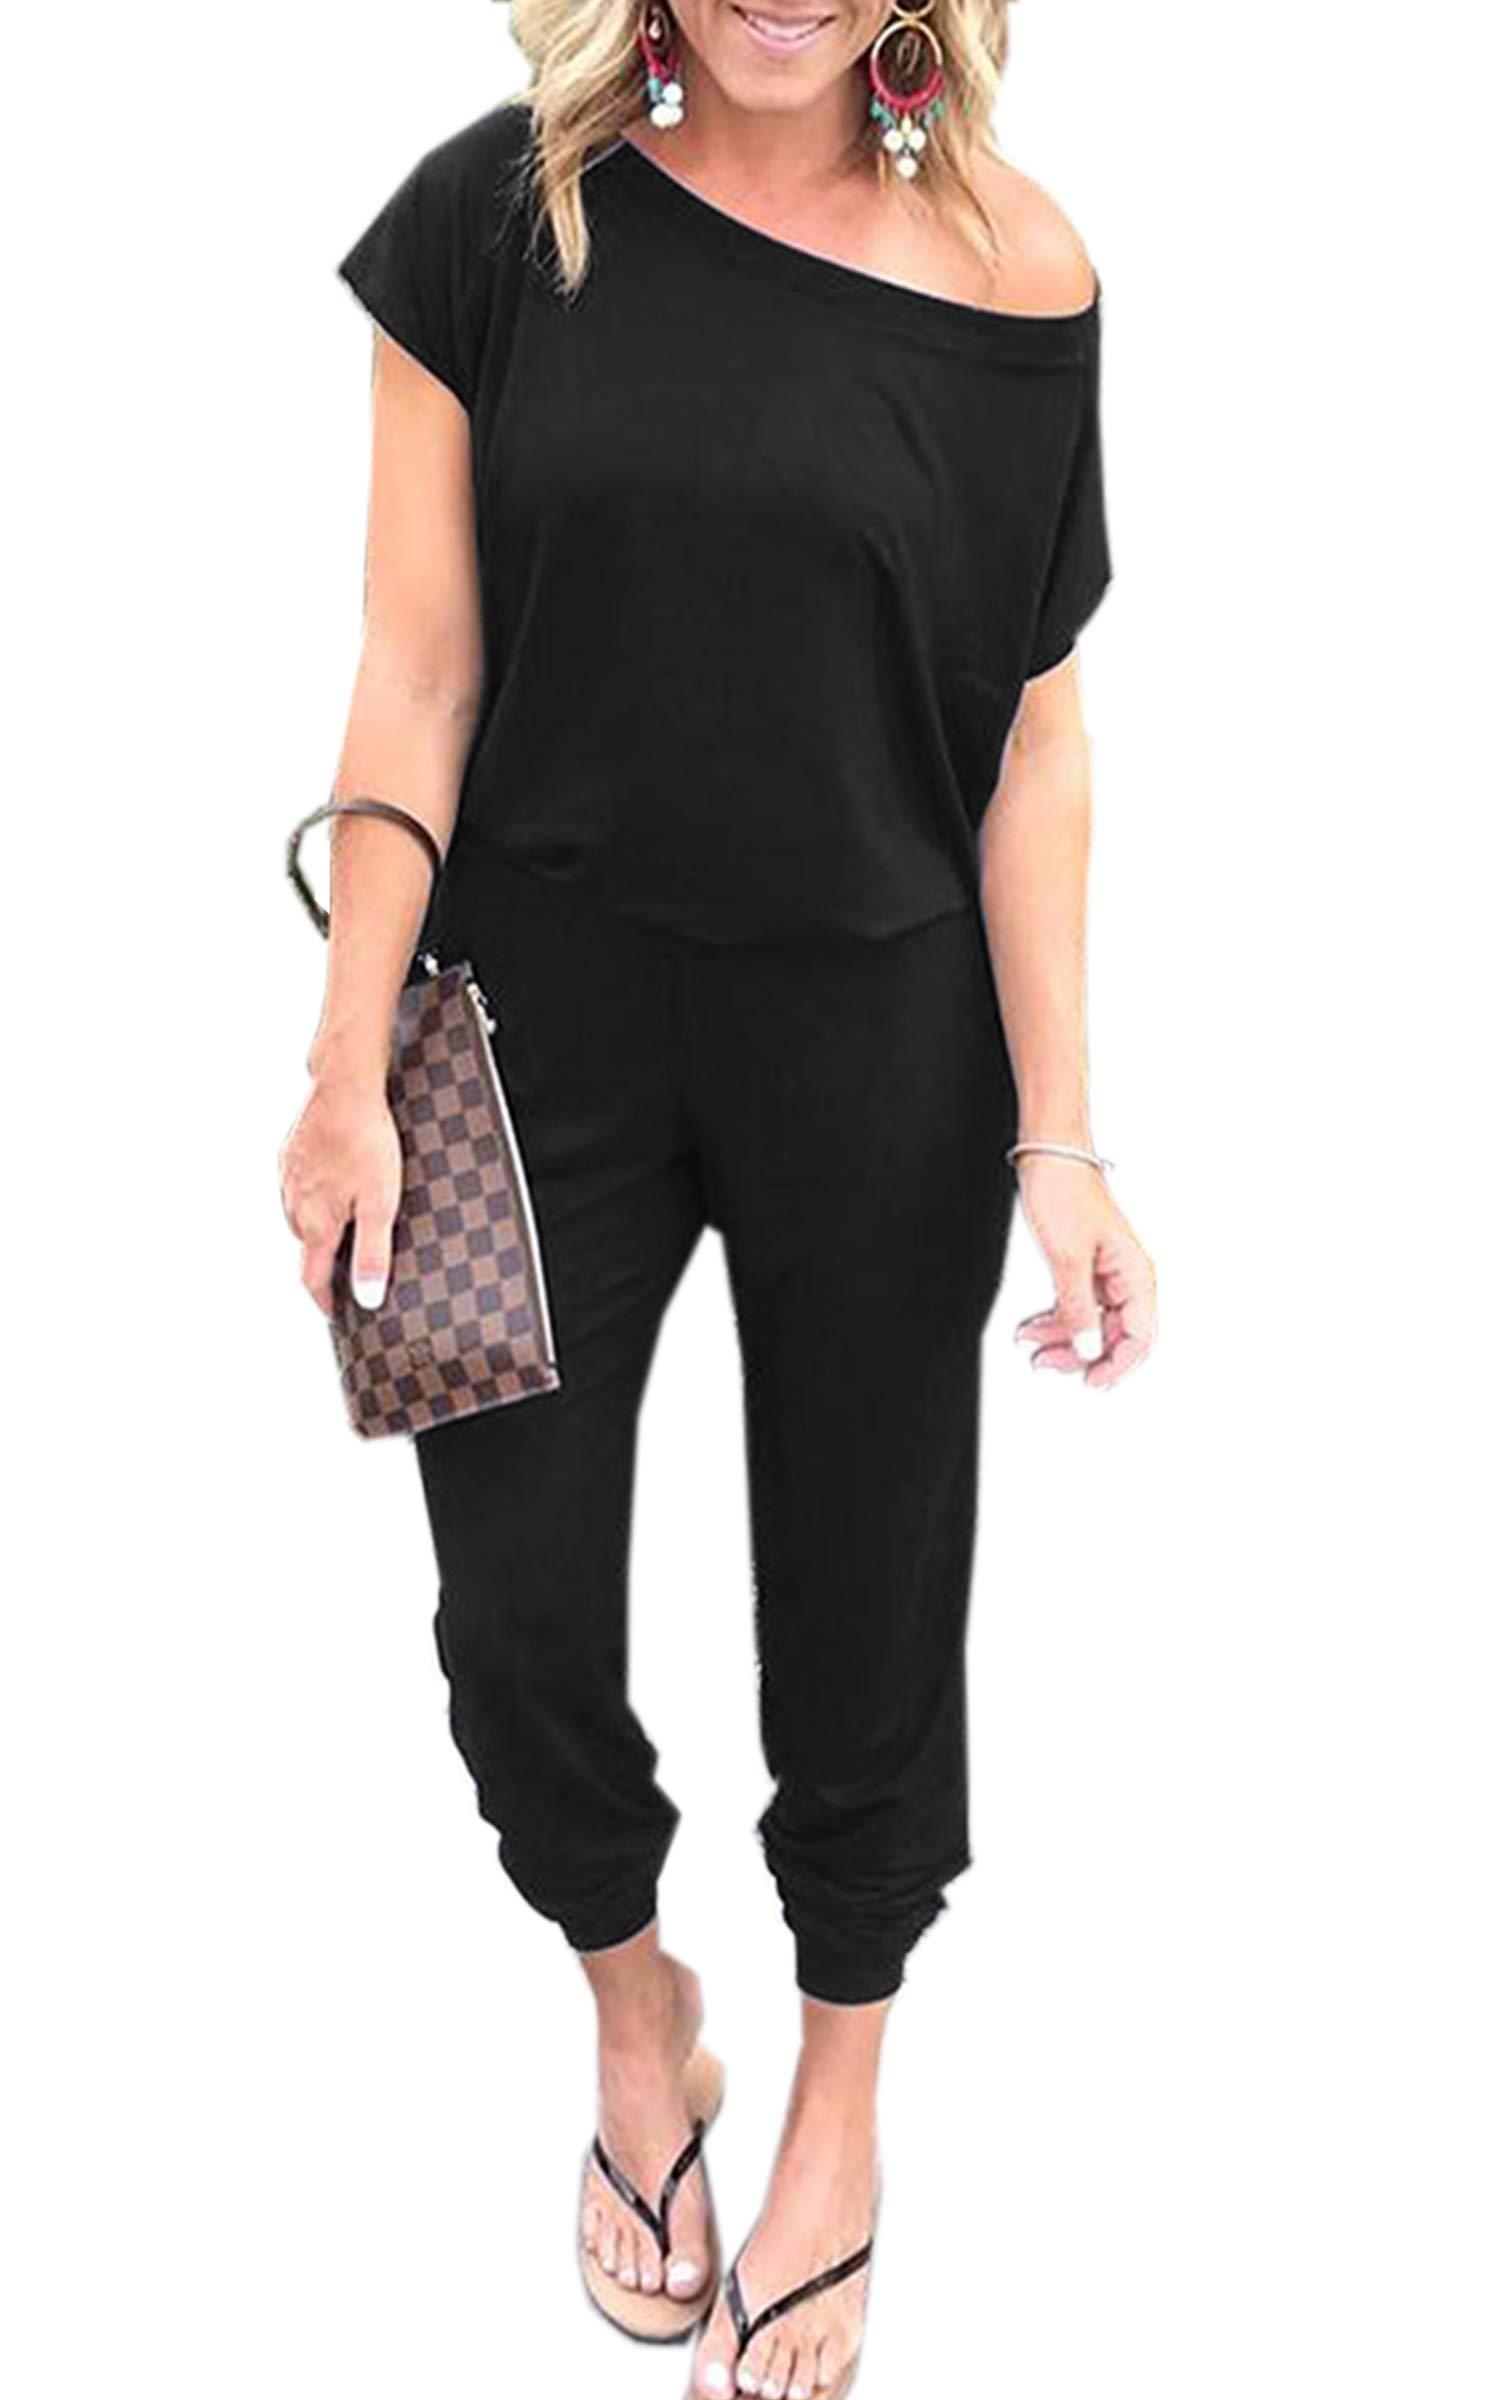 Angashion Women's Jumpsuits - Crewneck One Off Shoulder Short Sleeve Elastic Waist Romper Playsuits with Pockets Black M